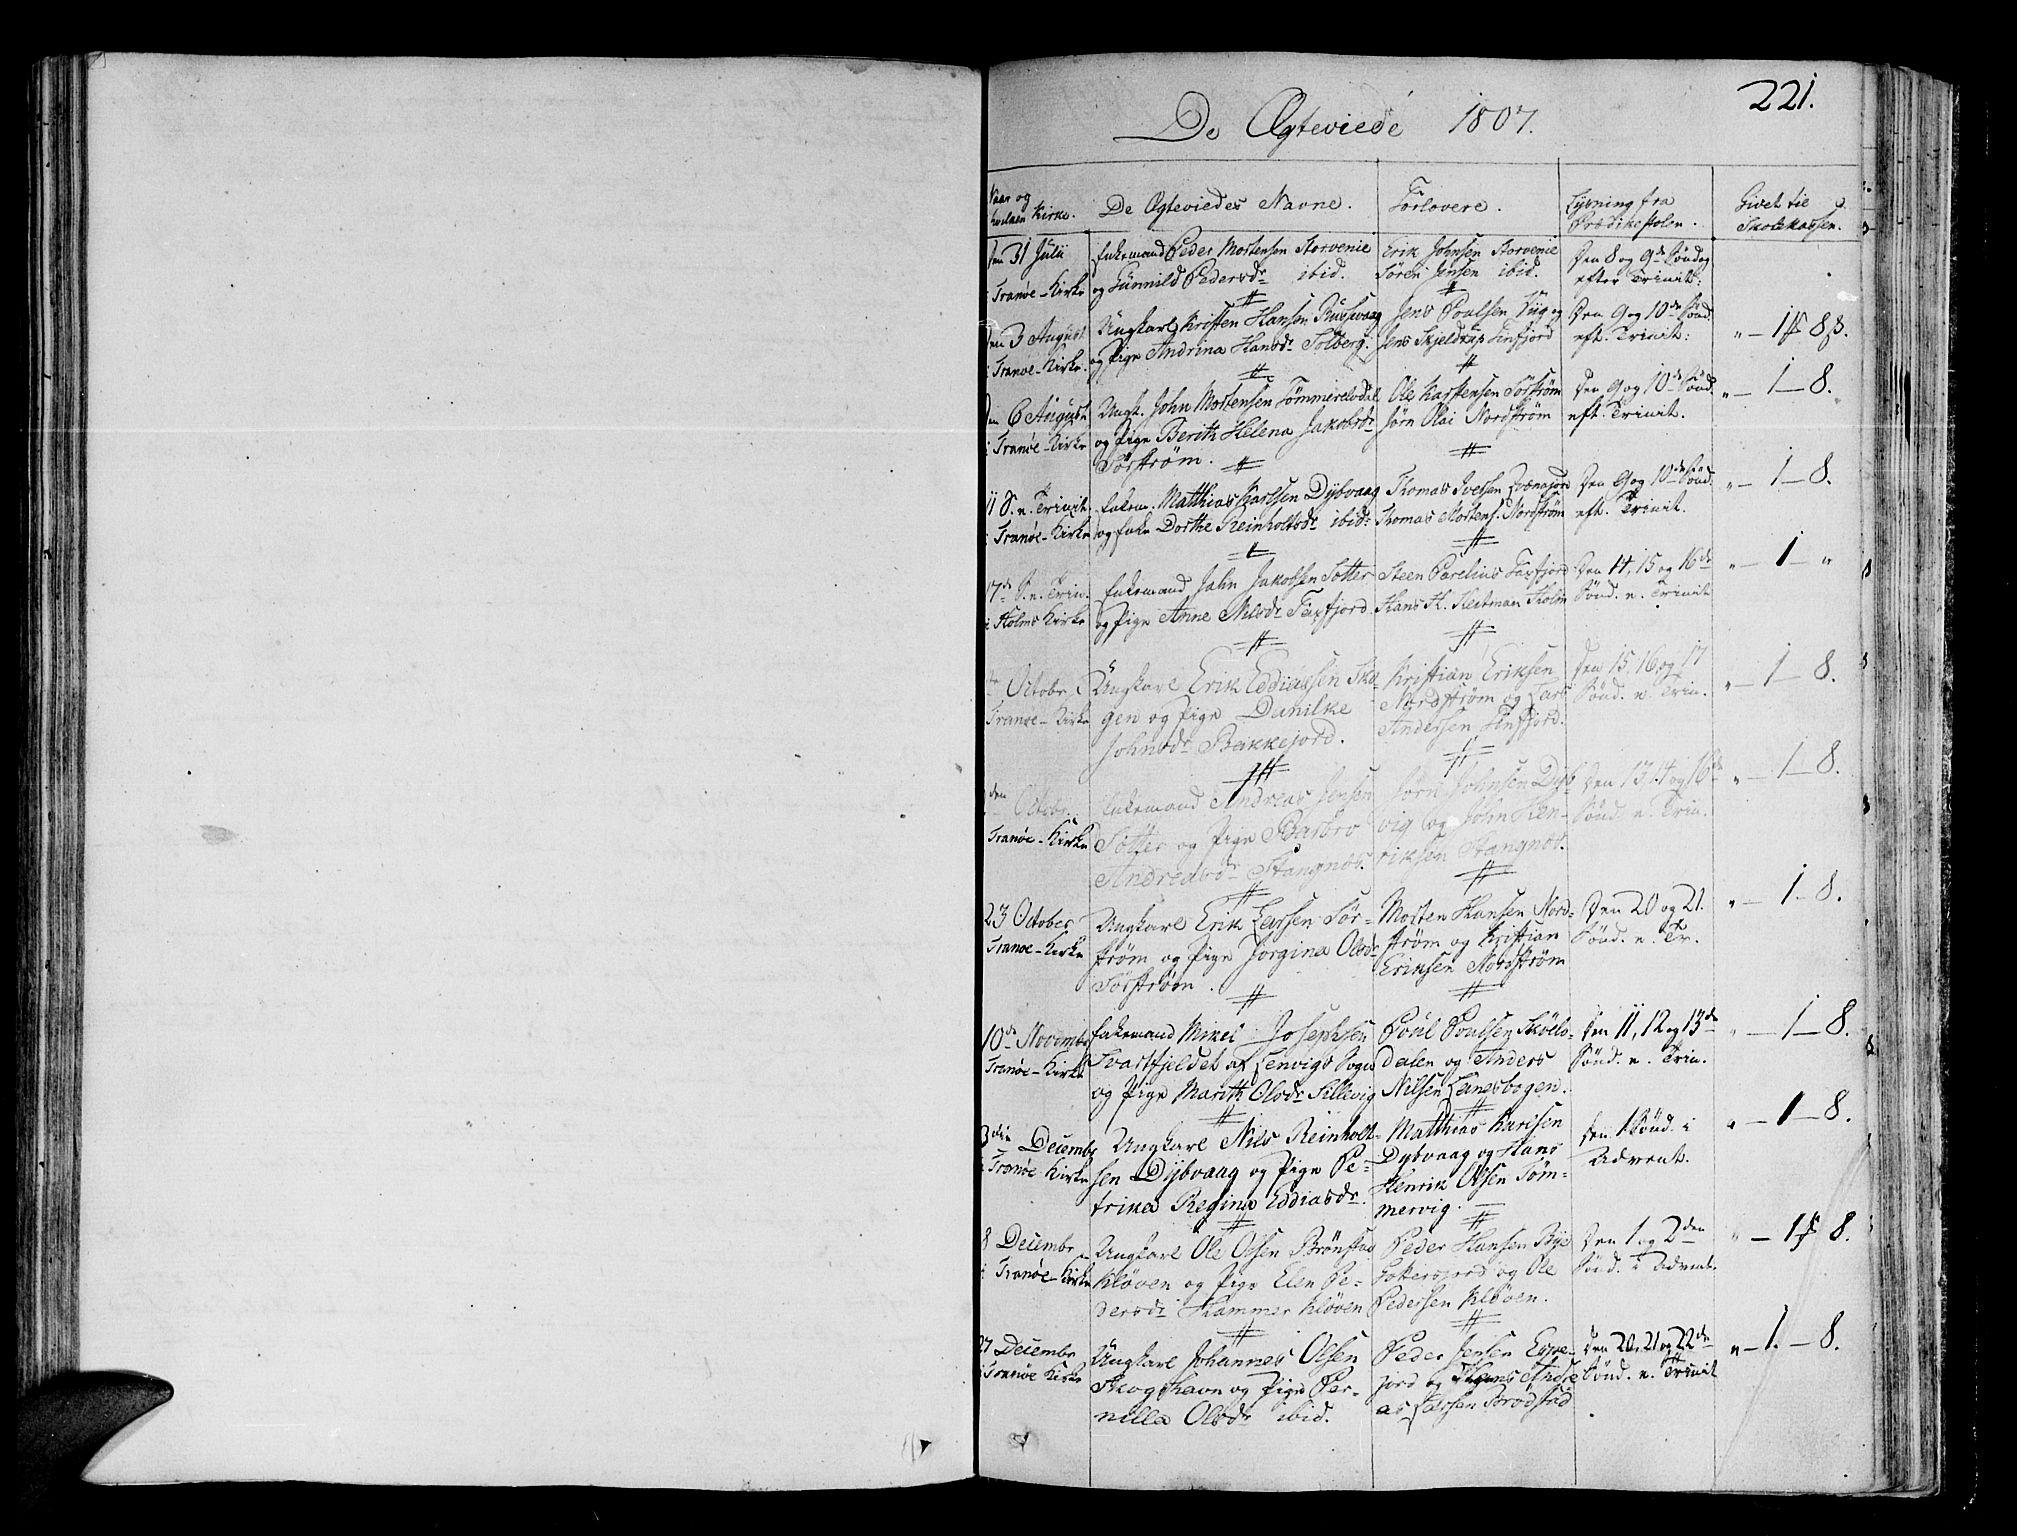 SATØ, Tranøy sokneprestkontor, I/Ia/Iaa/L0003kirke: Ministerialbok nr. 3, 1807-1820, s. 221